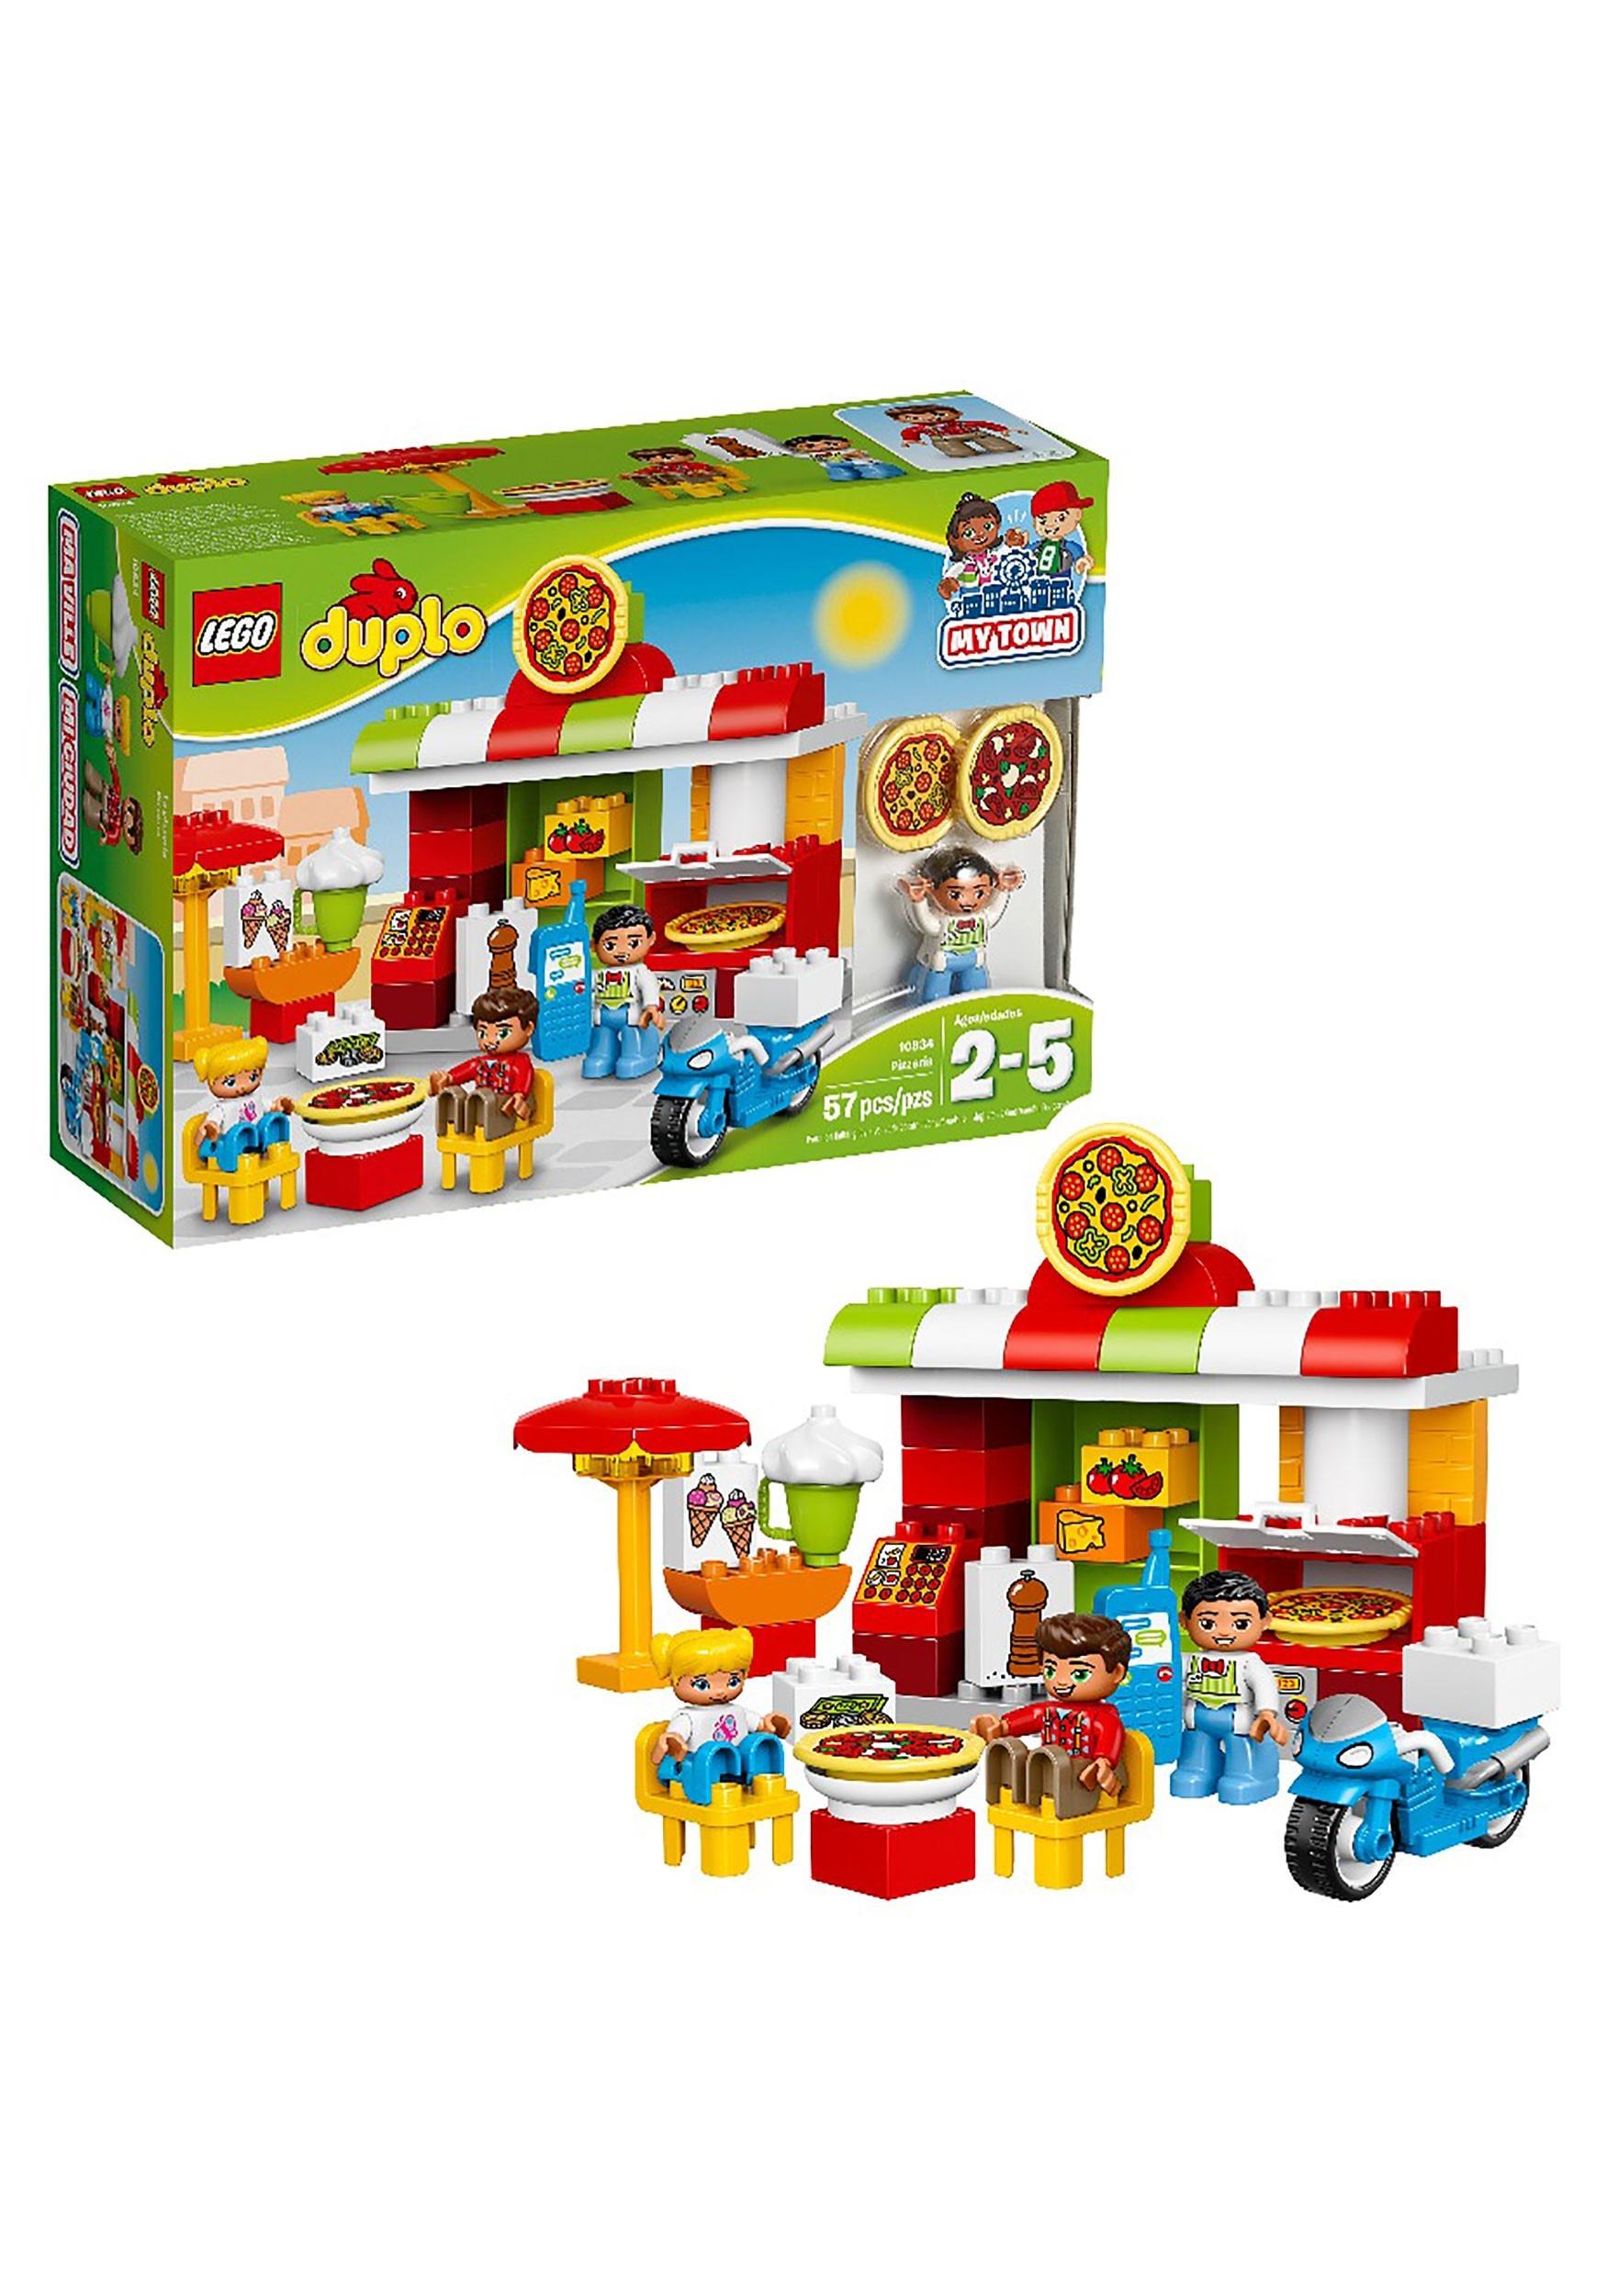 LEGO Duplo 57-Piece Set My Town Pizzeria